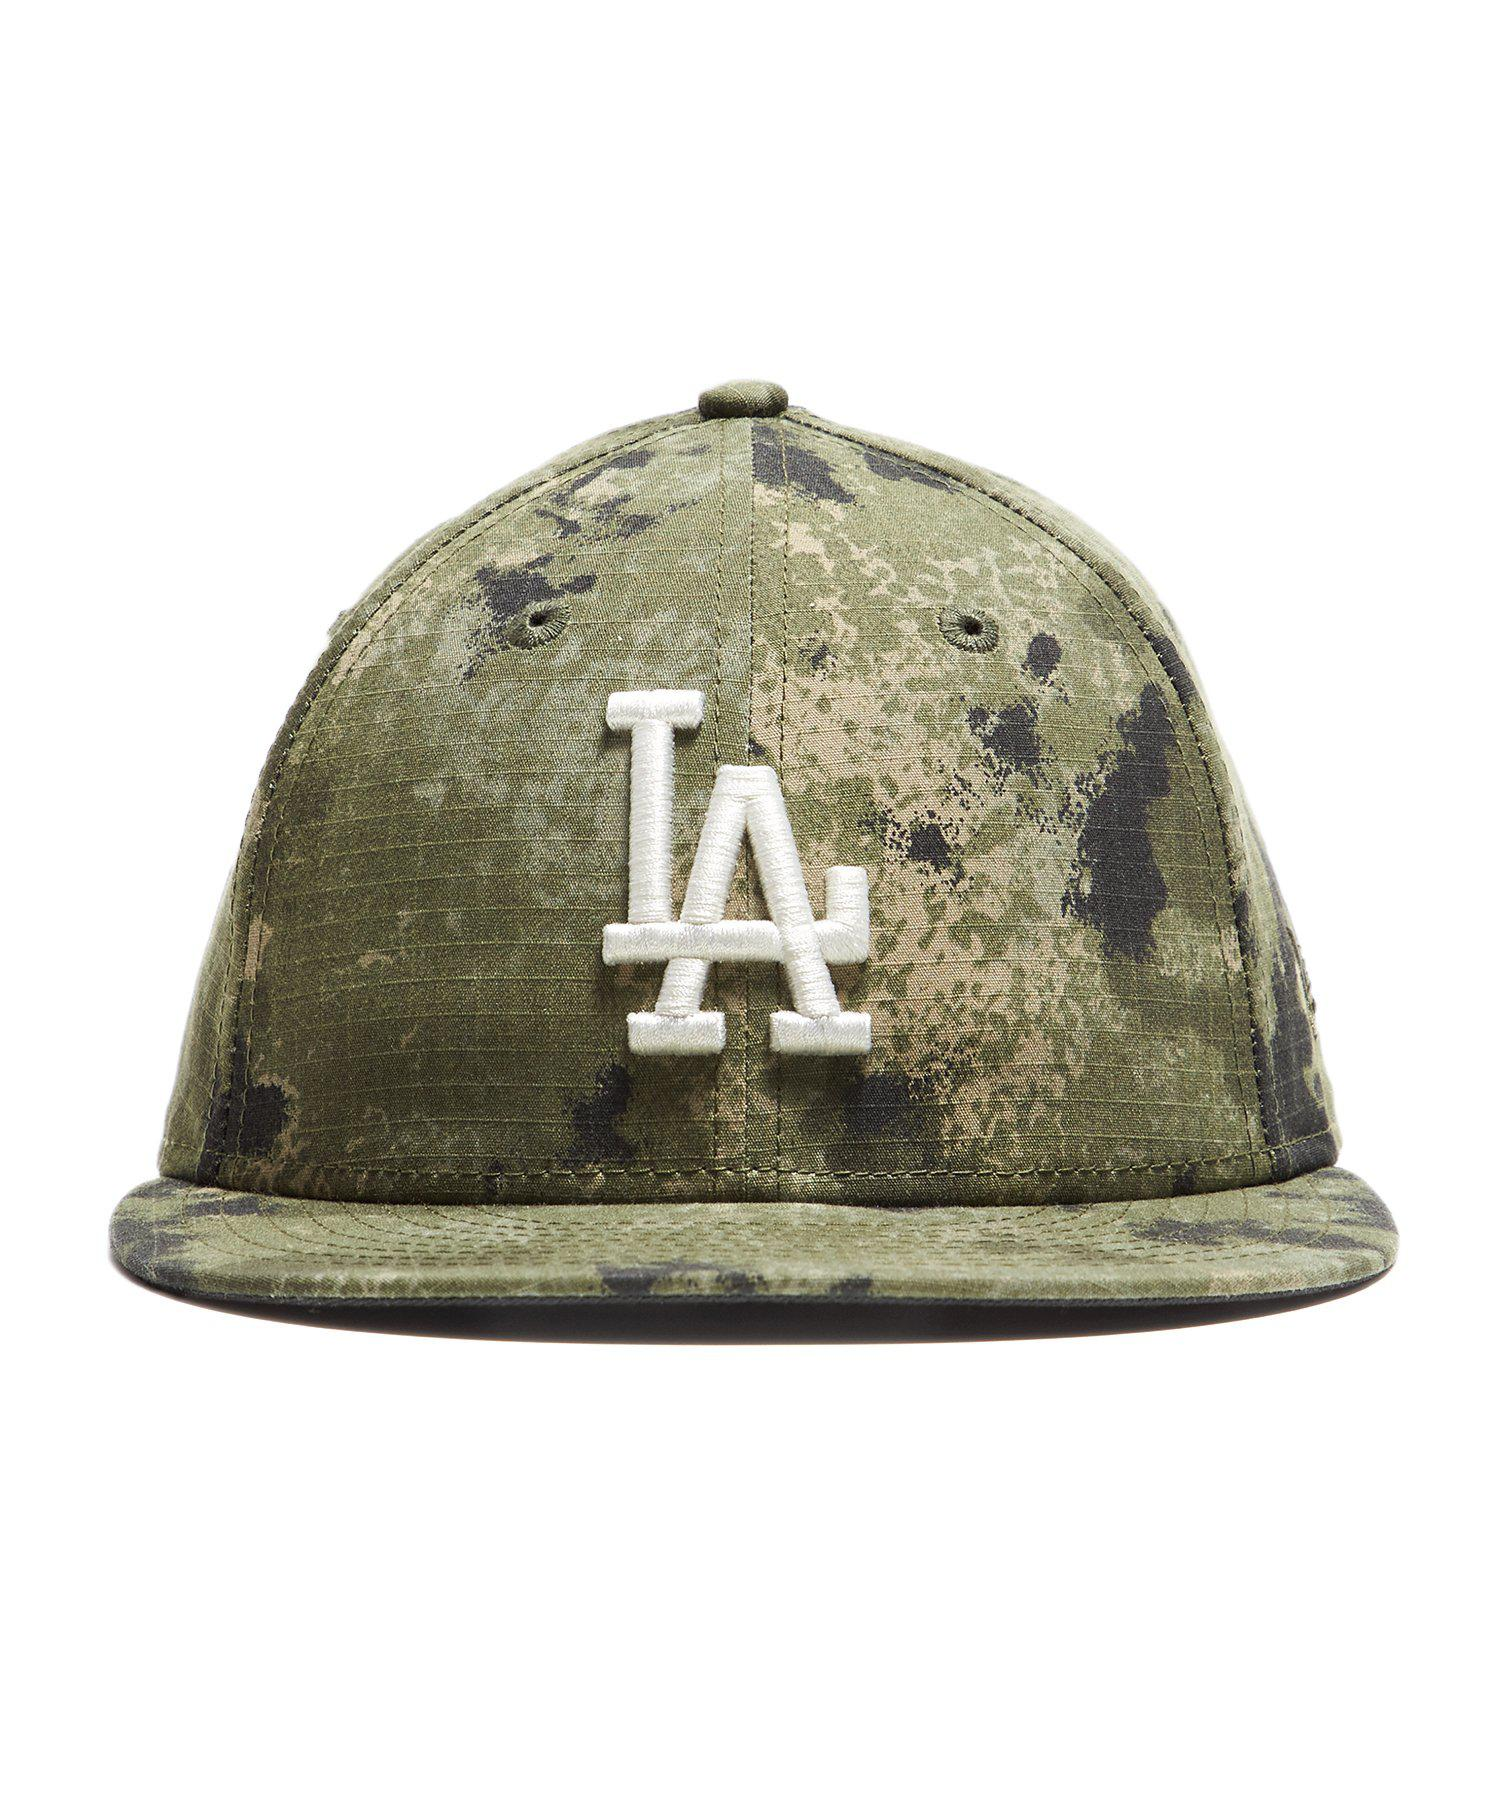 New Era Hats La Dodgers Cap In Camo Ripstop in Green for Men - Lyst f8f9d2123325